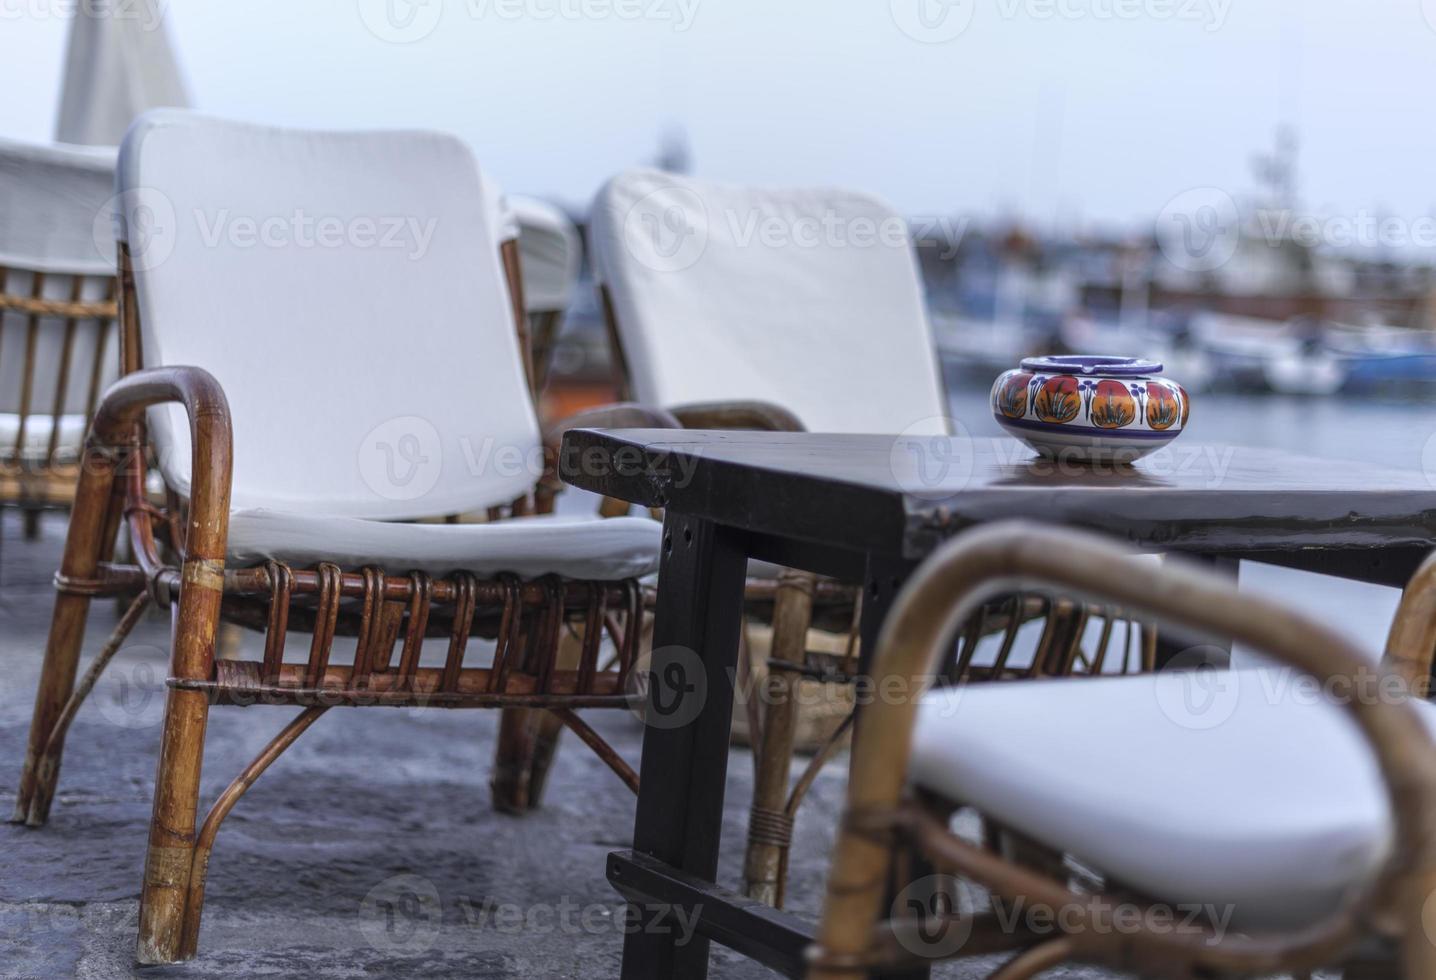 Sant'Angelo d'Ischia, bar harbor. Italo relax. Fashion photo